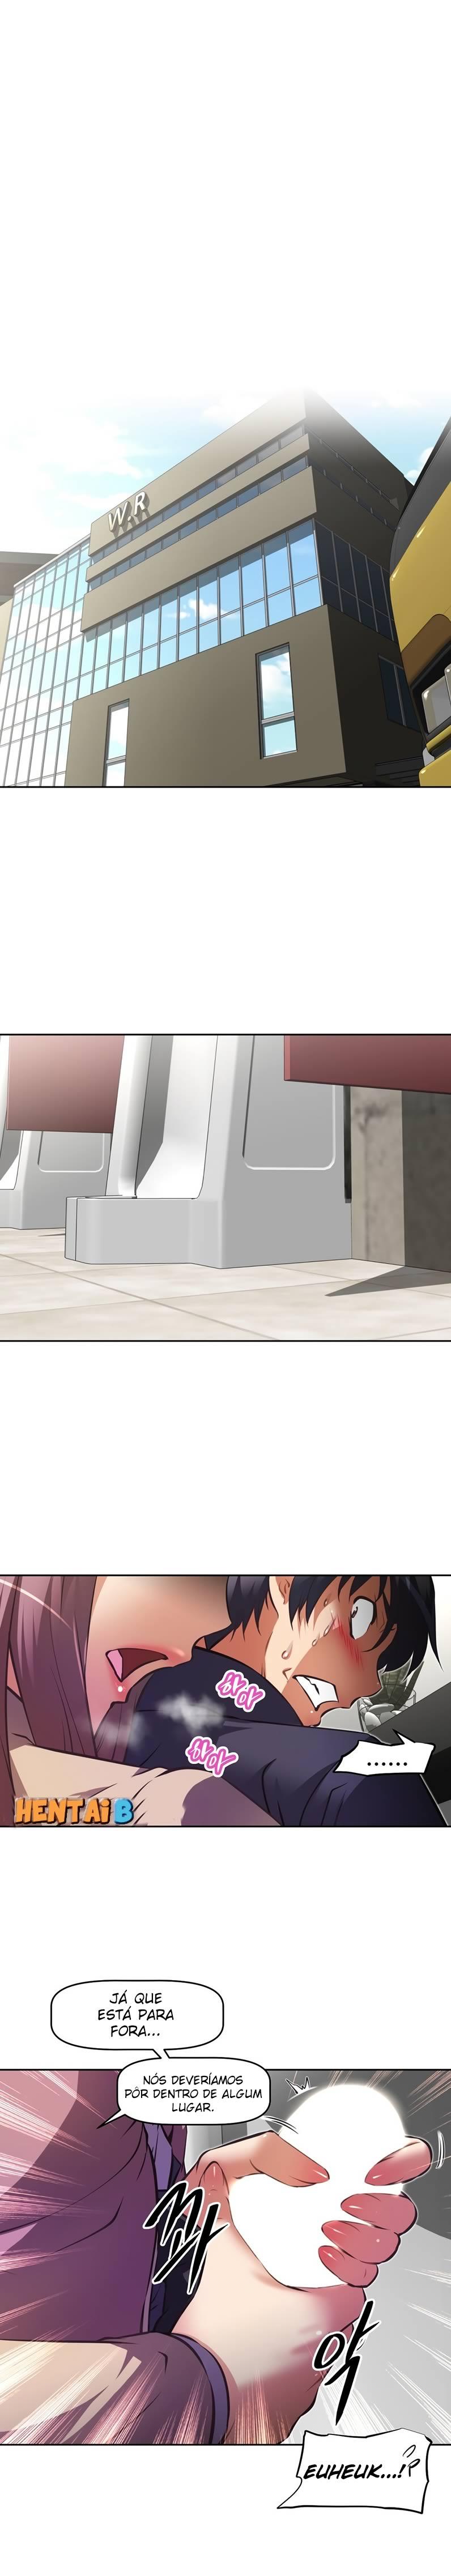 01 3 - Brawling Go! #113 Hentai HQ